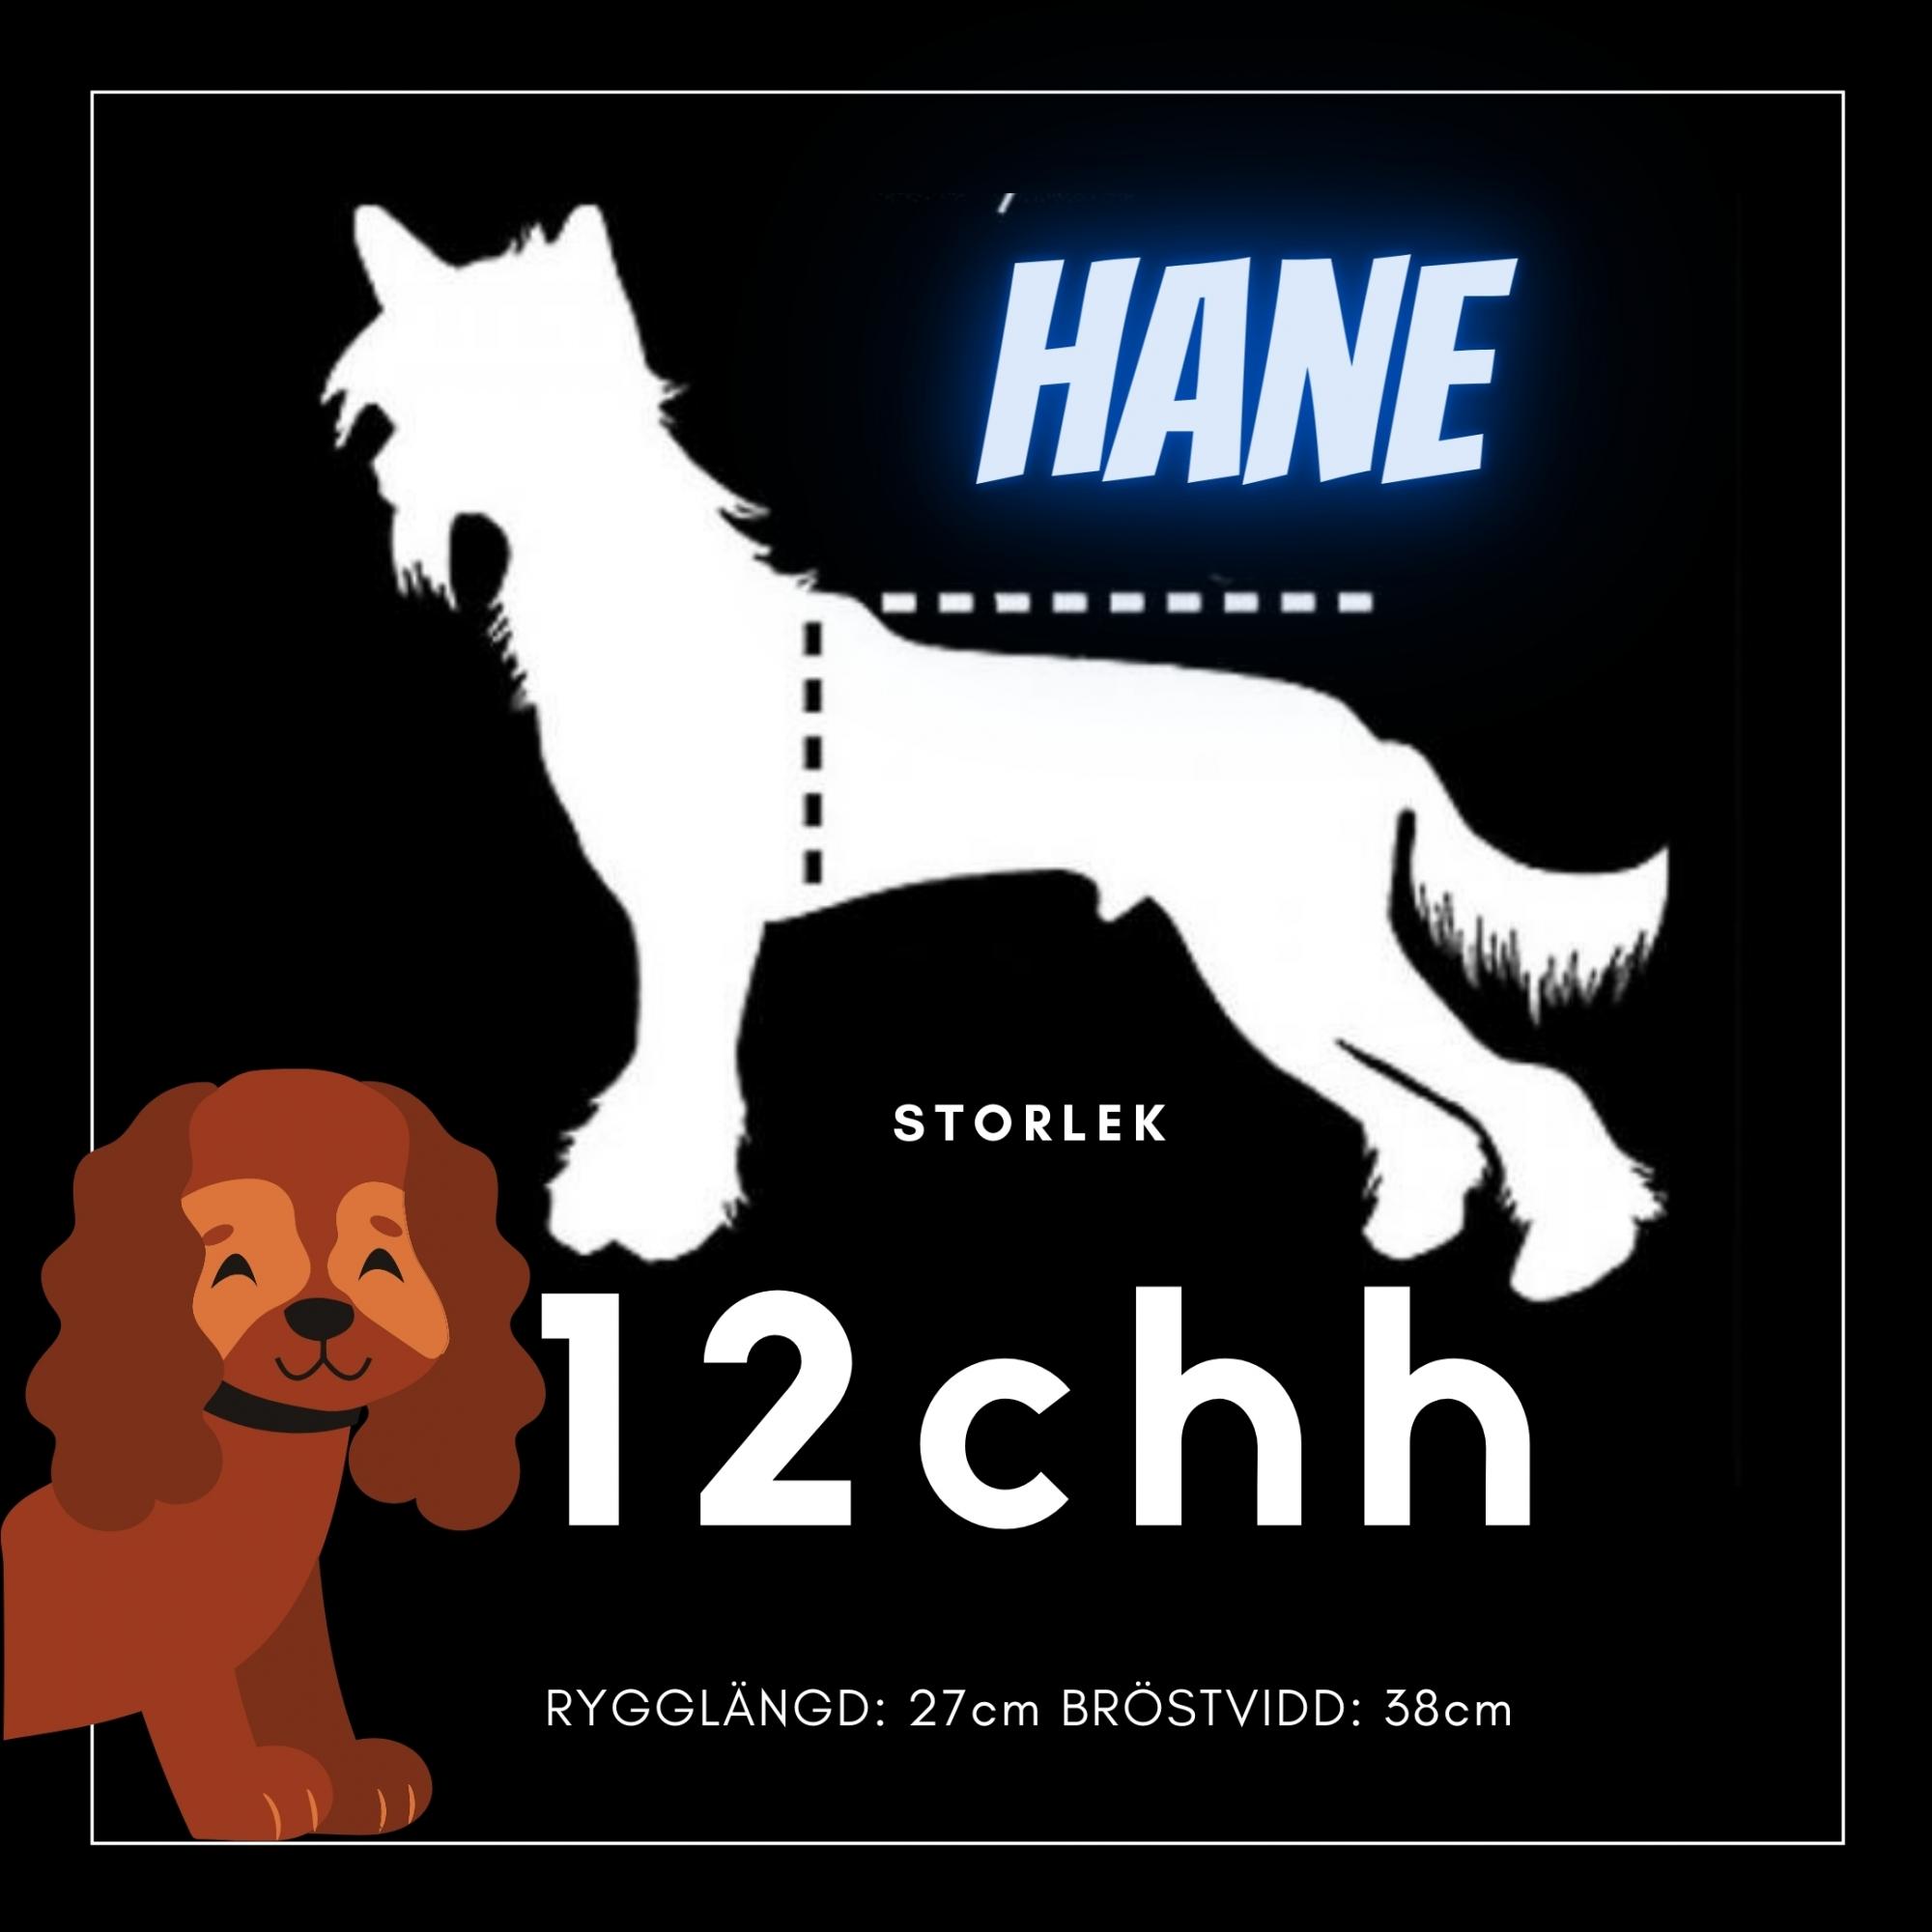 Hane Storlek 12chh - Passion For Pet Fashion